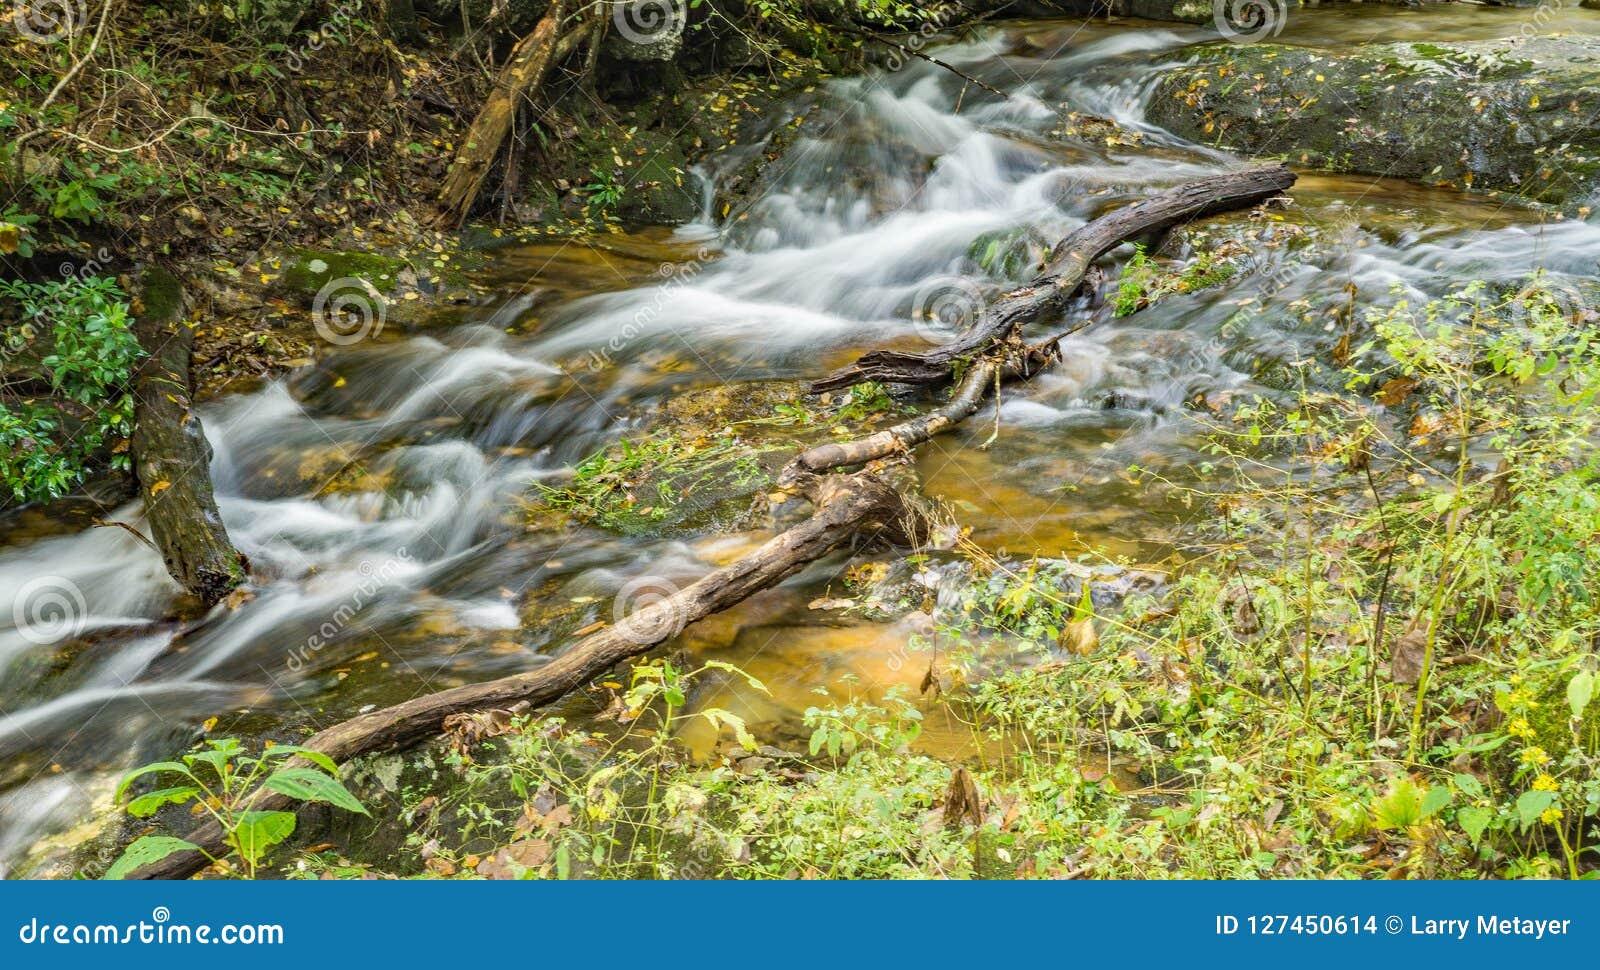 Mountain Creek, Blue Ridge Mountains of Virginia, USA